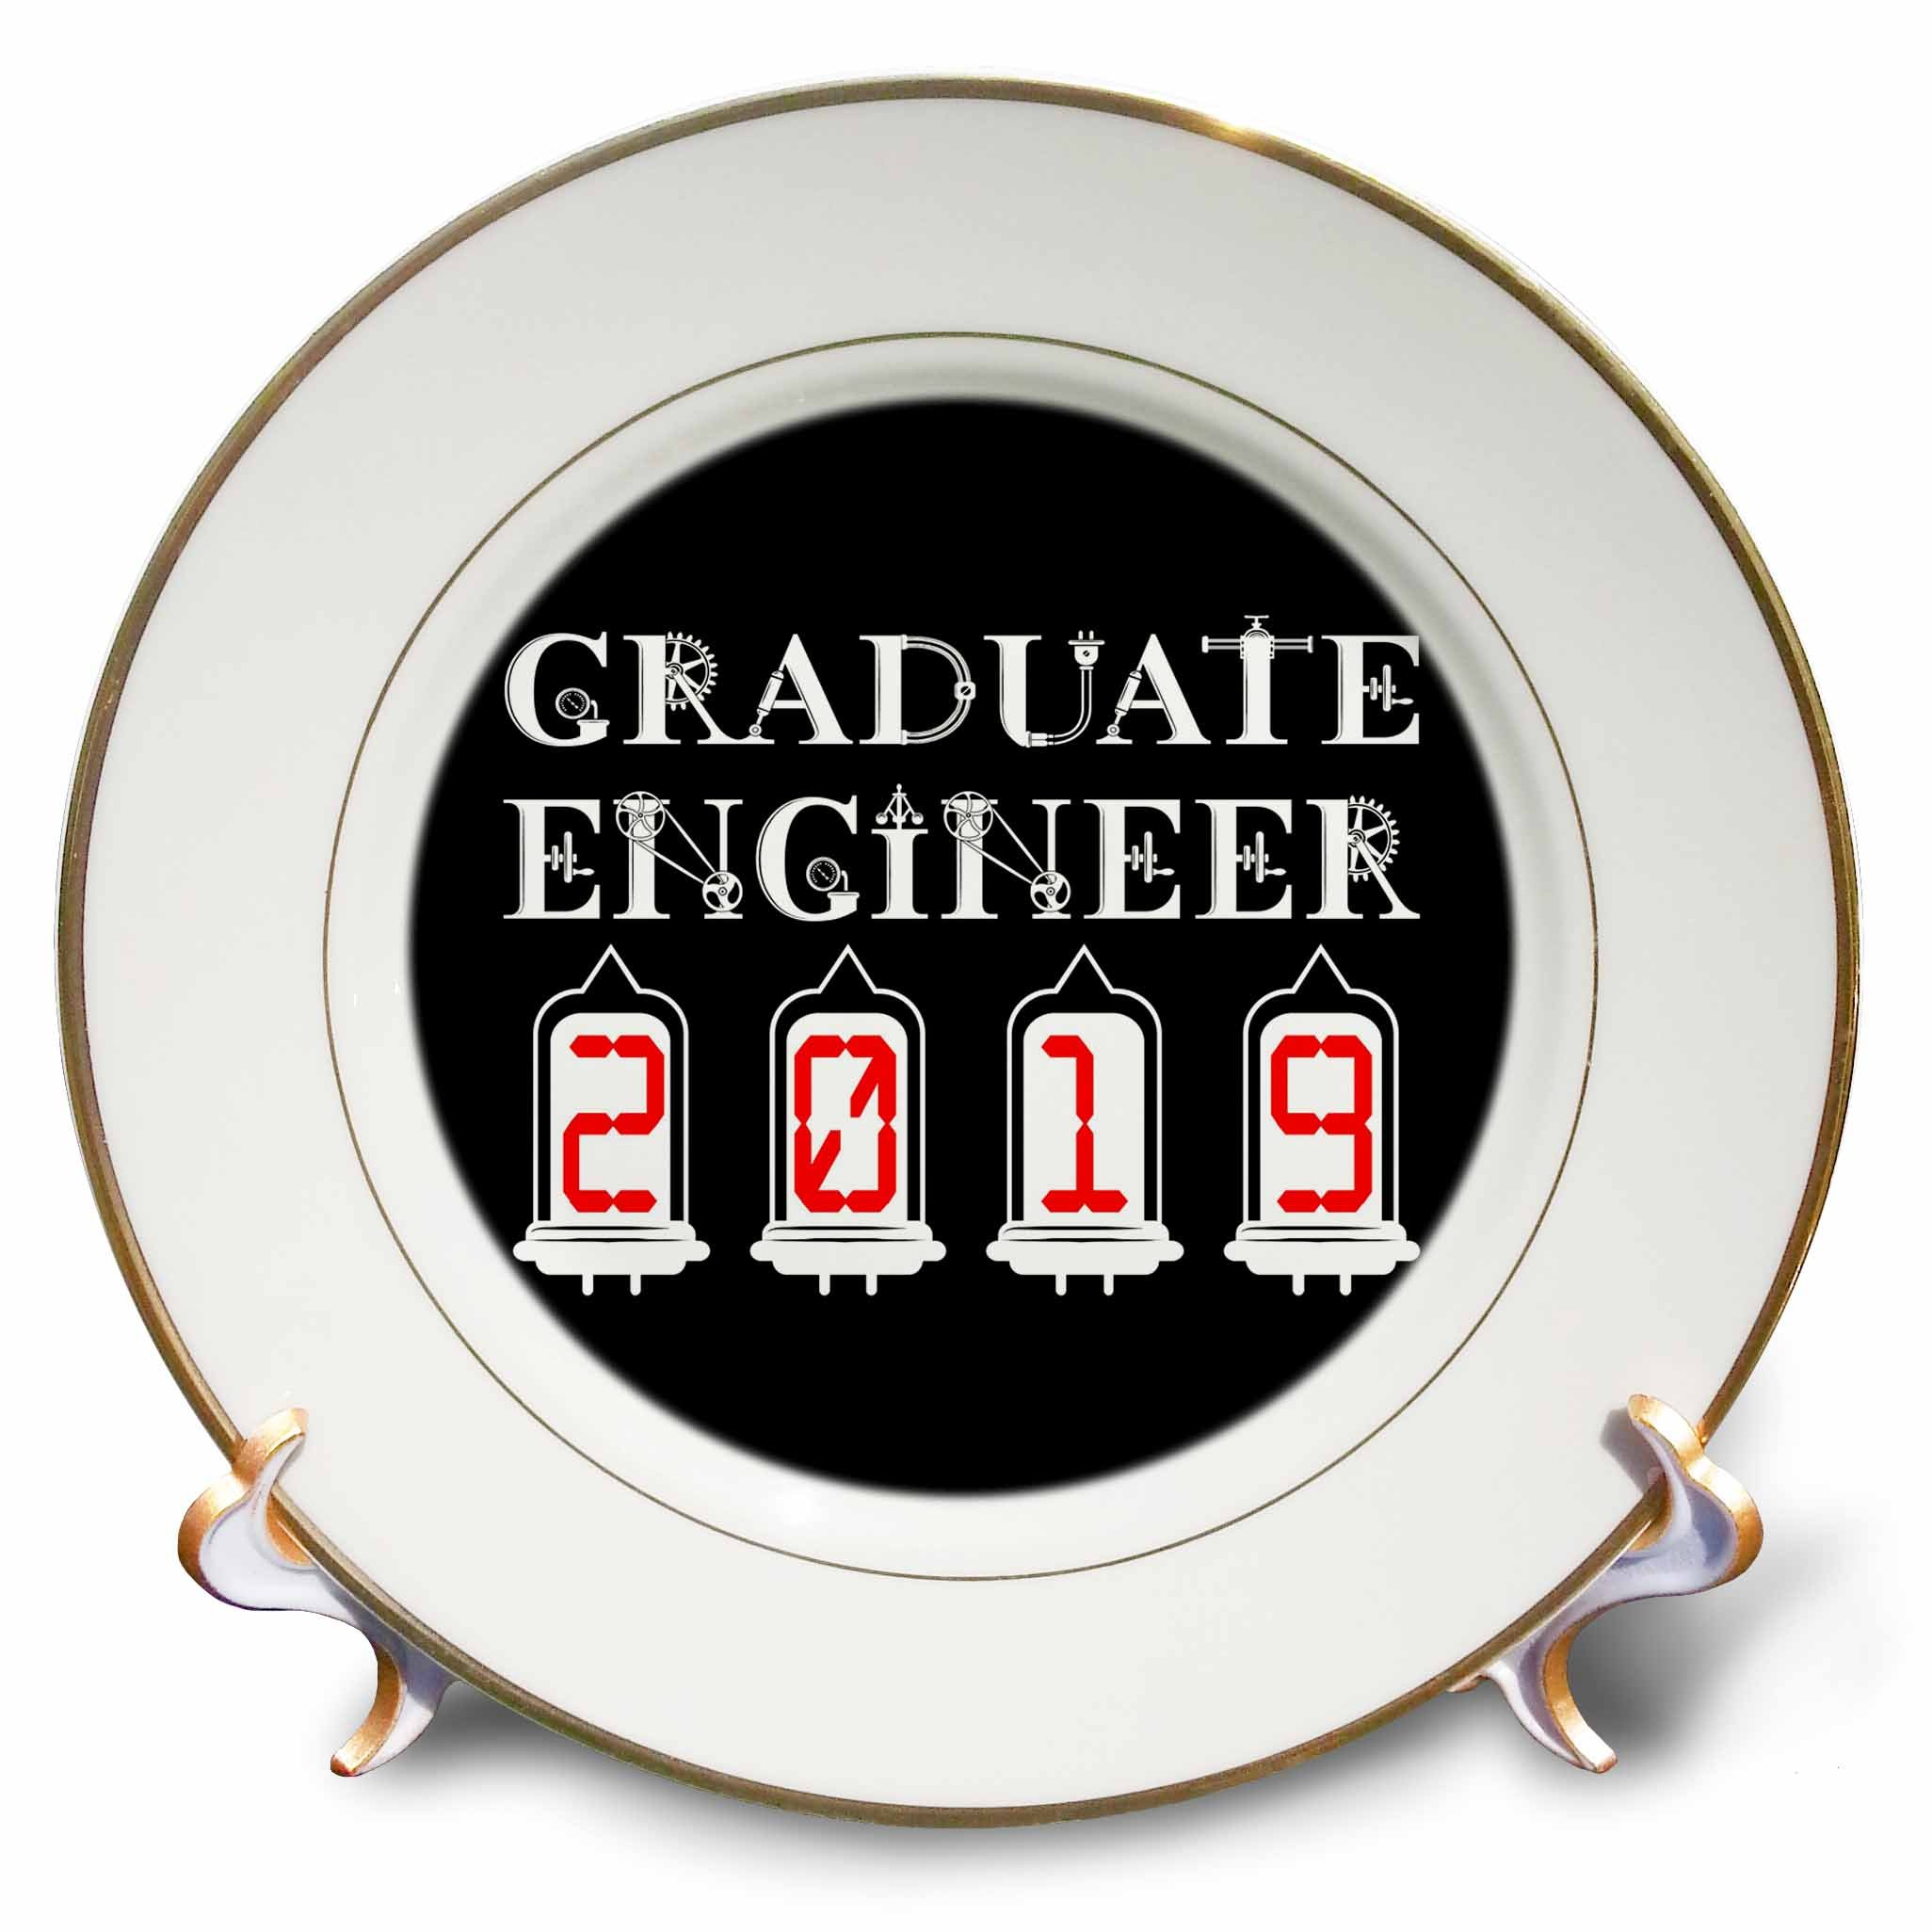 3dRose Alexis Design - Graduate Engineer - Graduate engineer 2019. Elegant, unique text on black background - 8 inch Porcelain Plate (cp_286042_1)